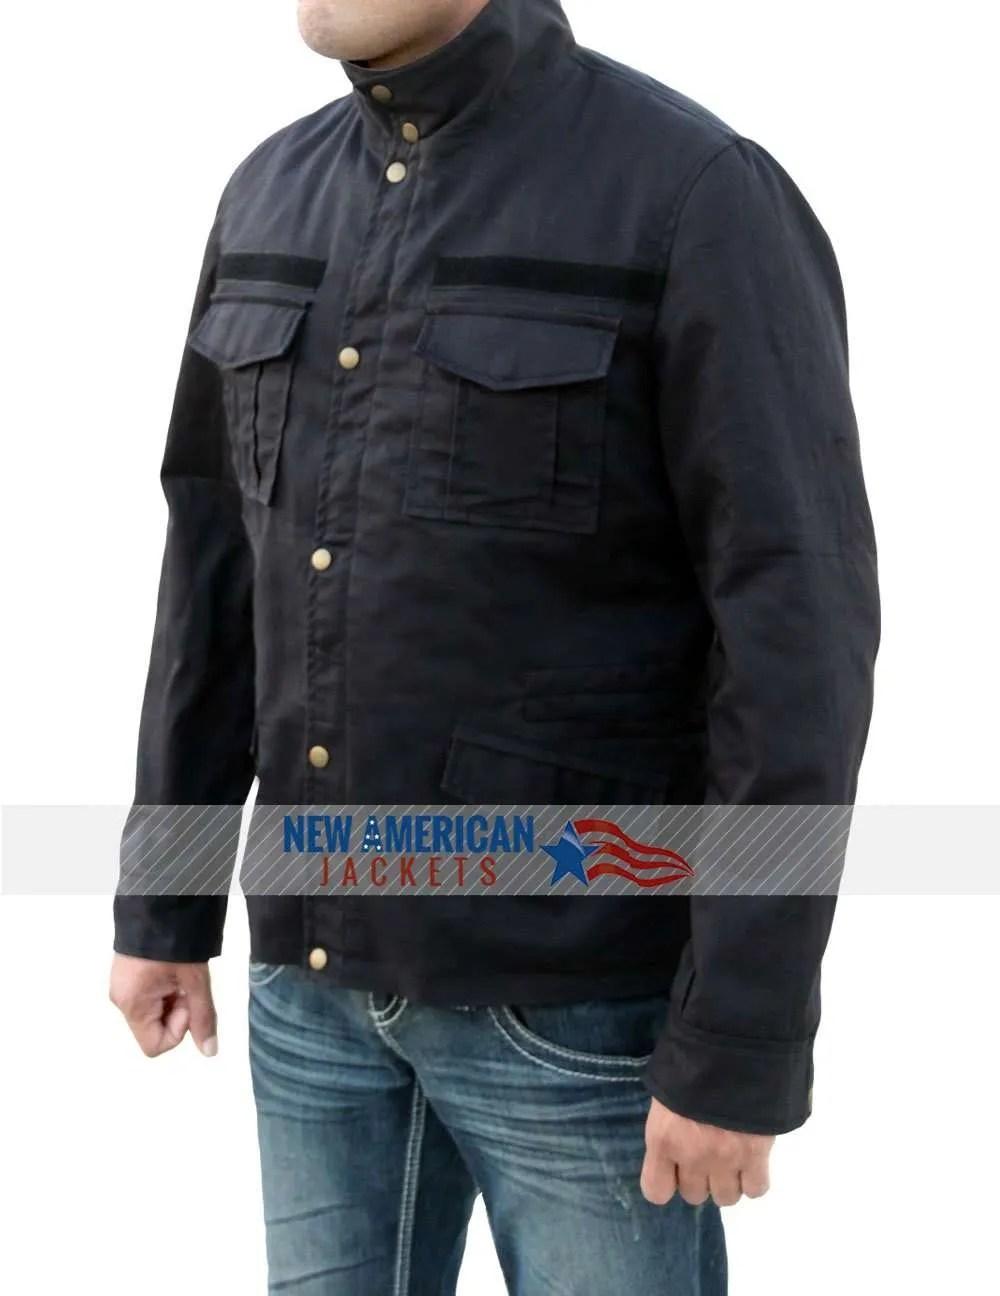 Ant Man Jacket Scott Lang Paul Rudd Jacket